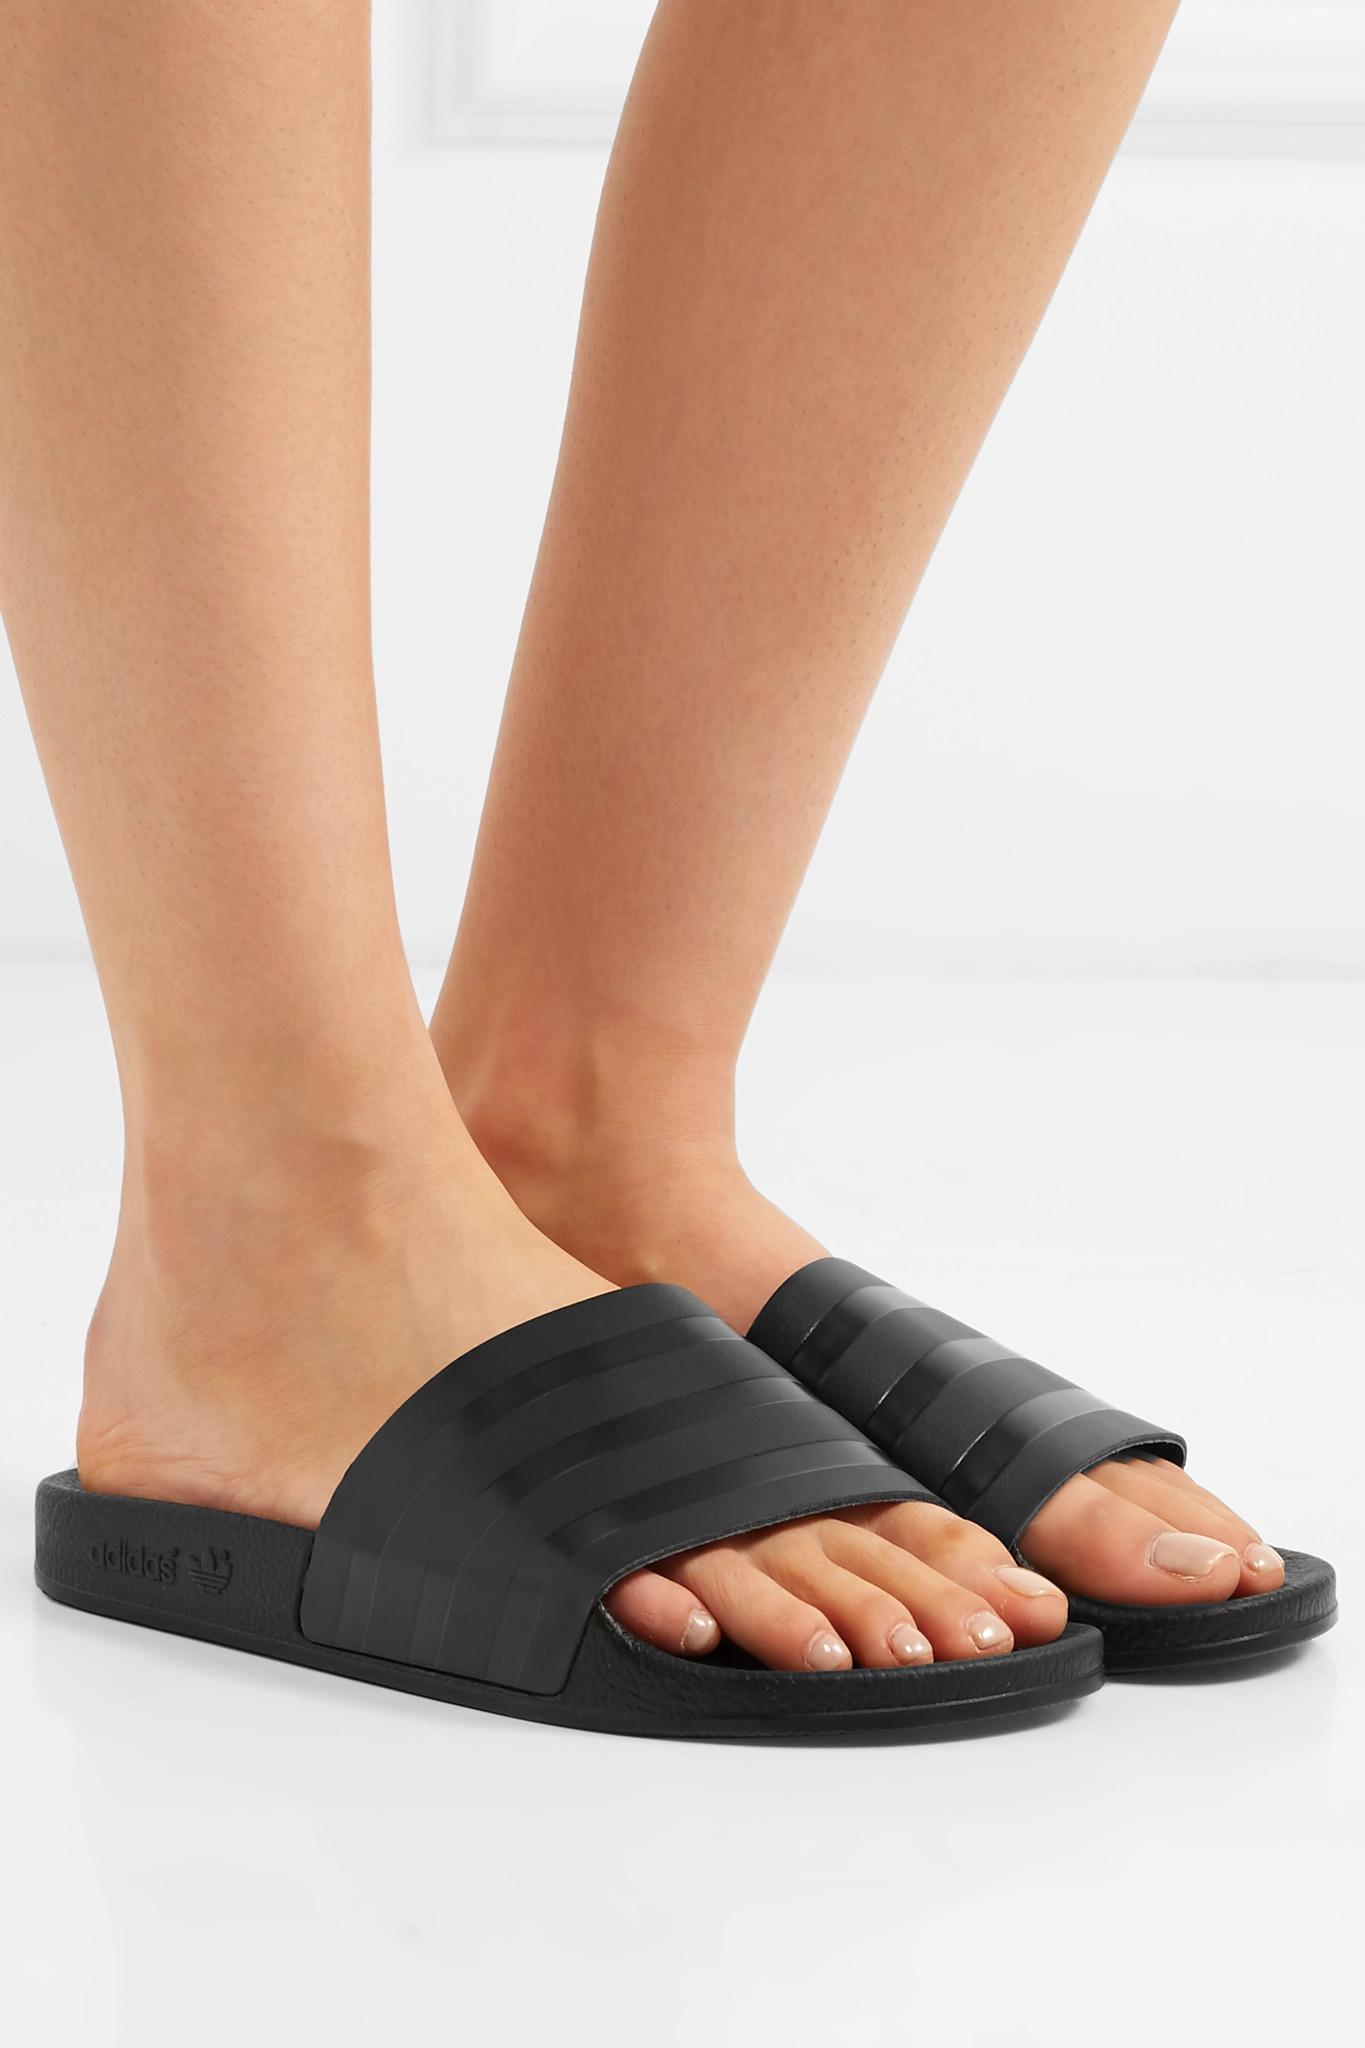 1a51441481da adidas Originals Adilette Striped Leather Slides in Black - Lyst